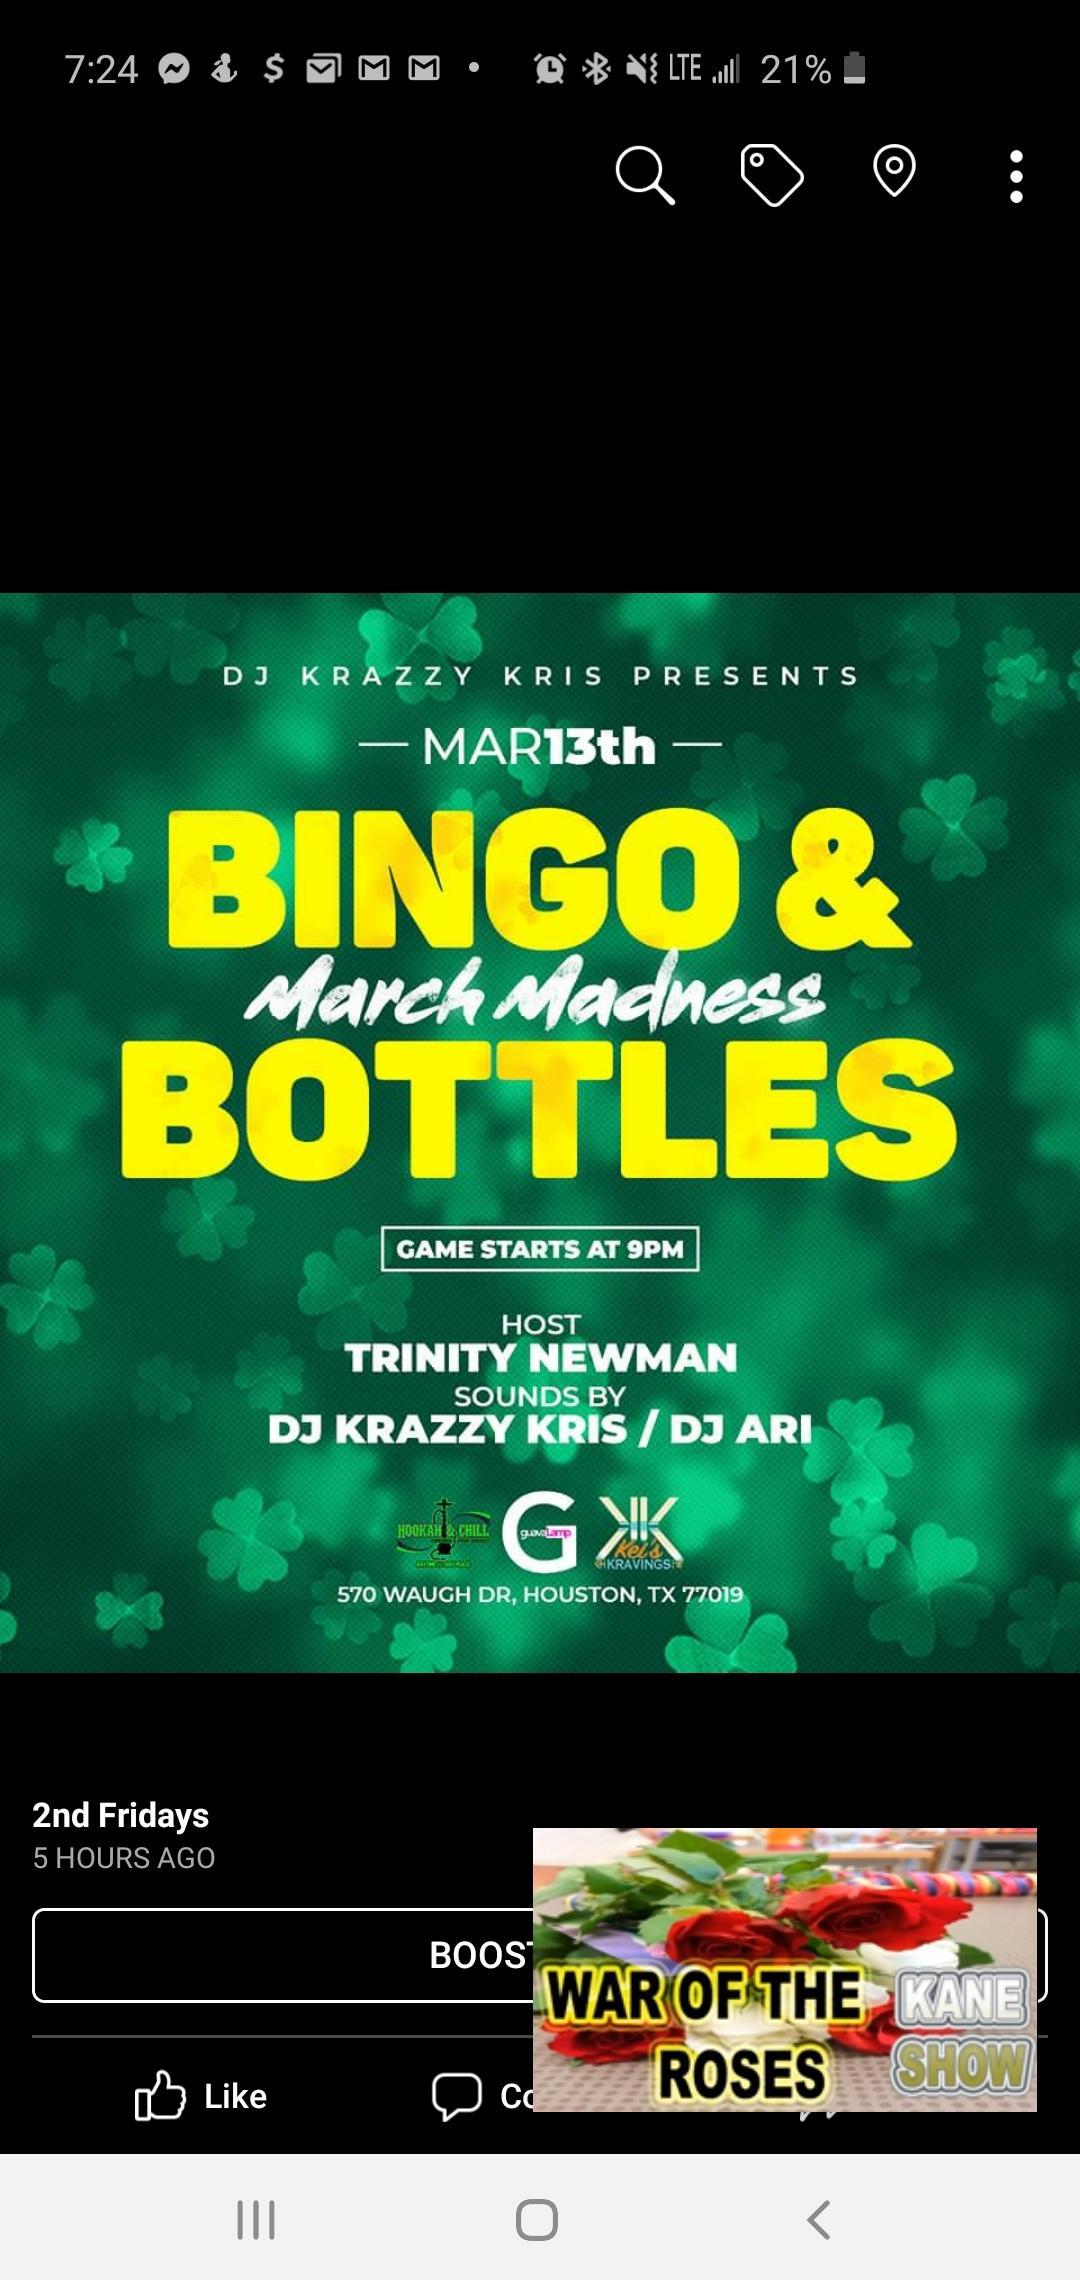 Bingo & Bottles @ 2nd Fridays